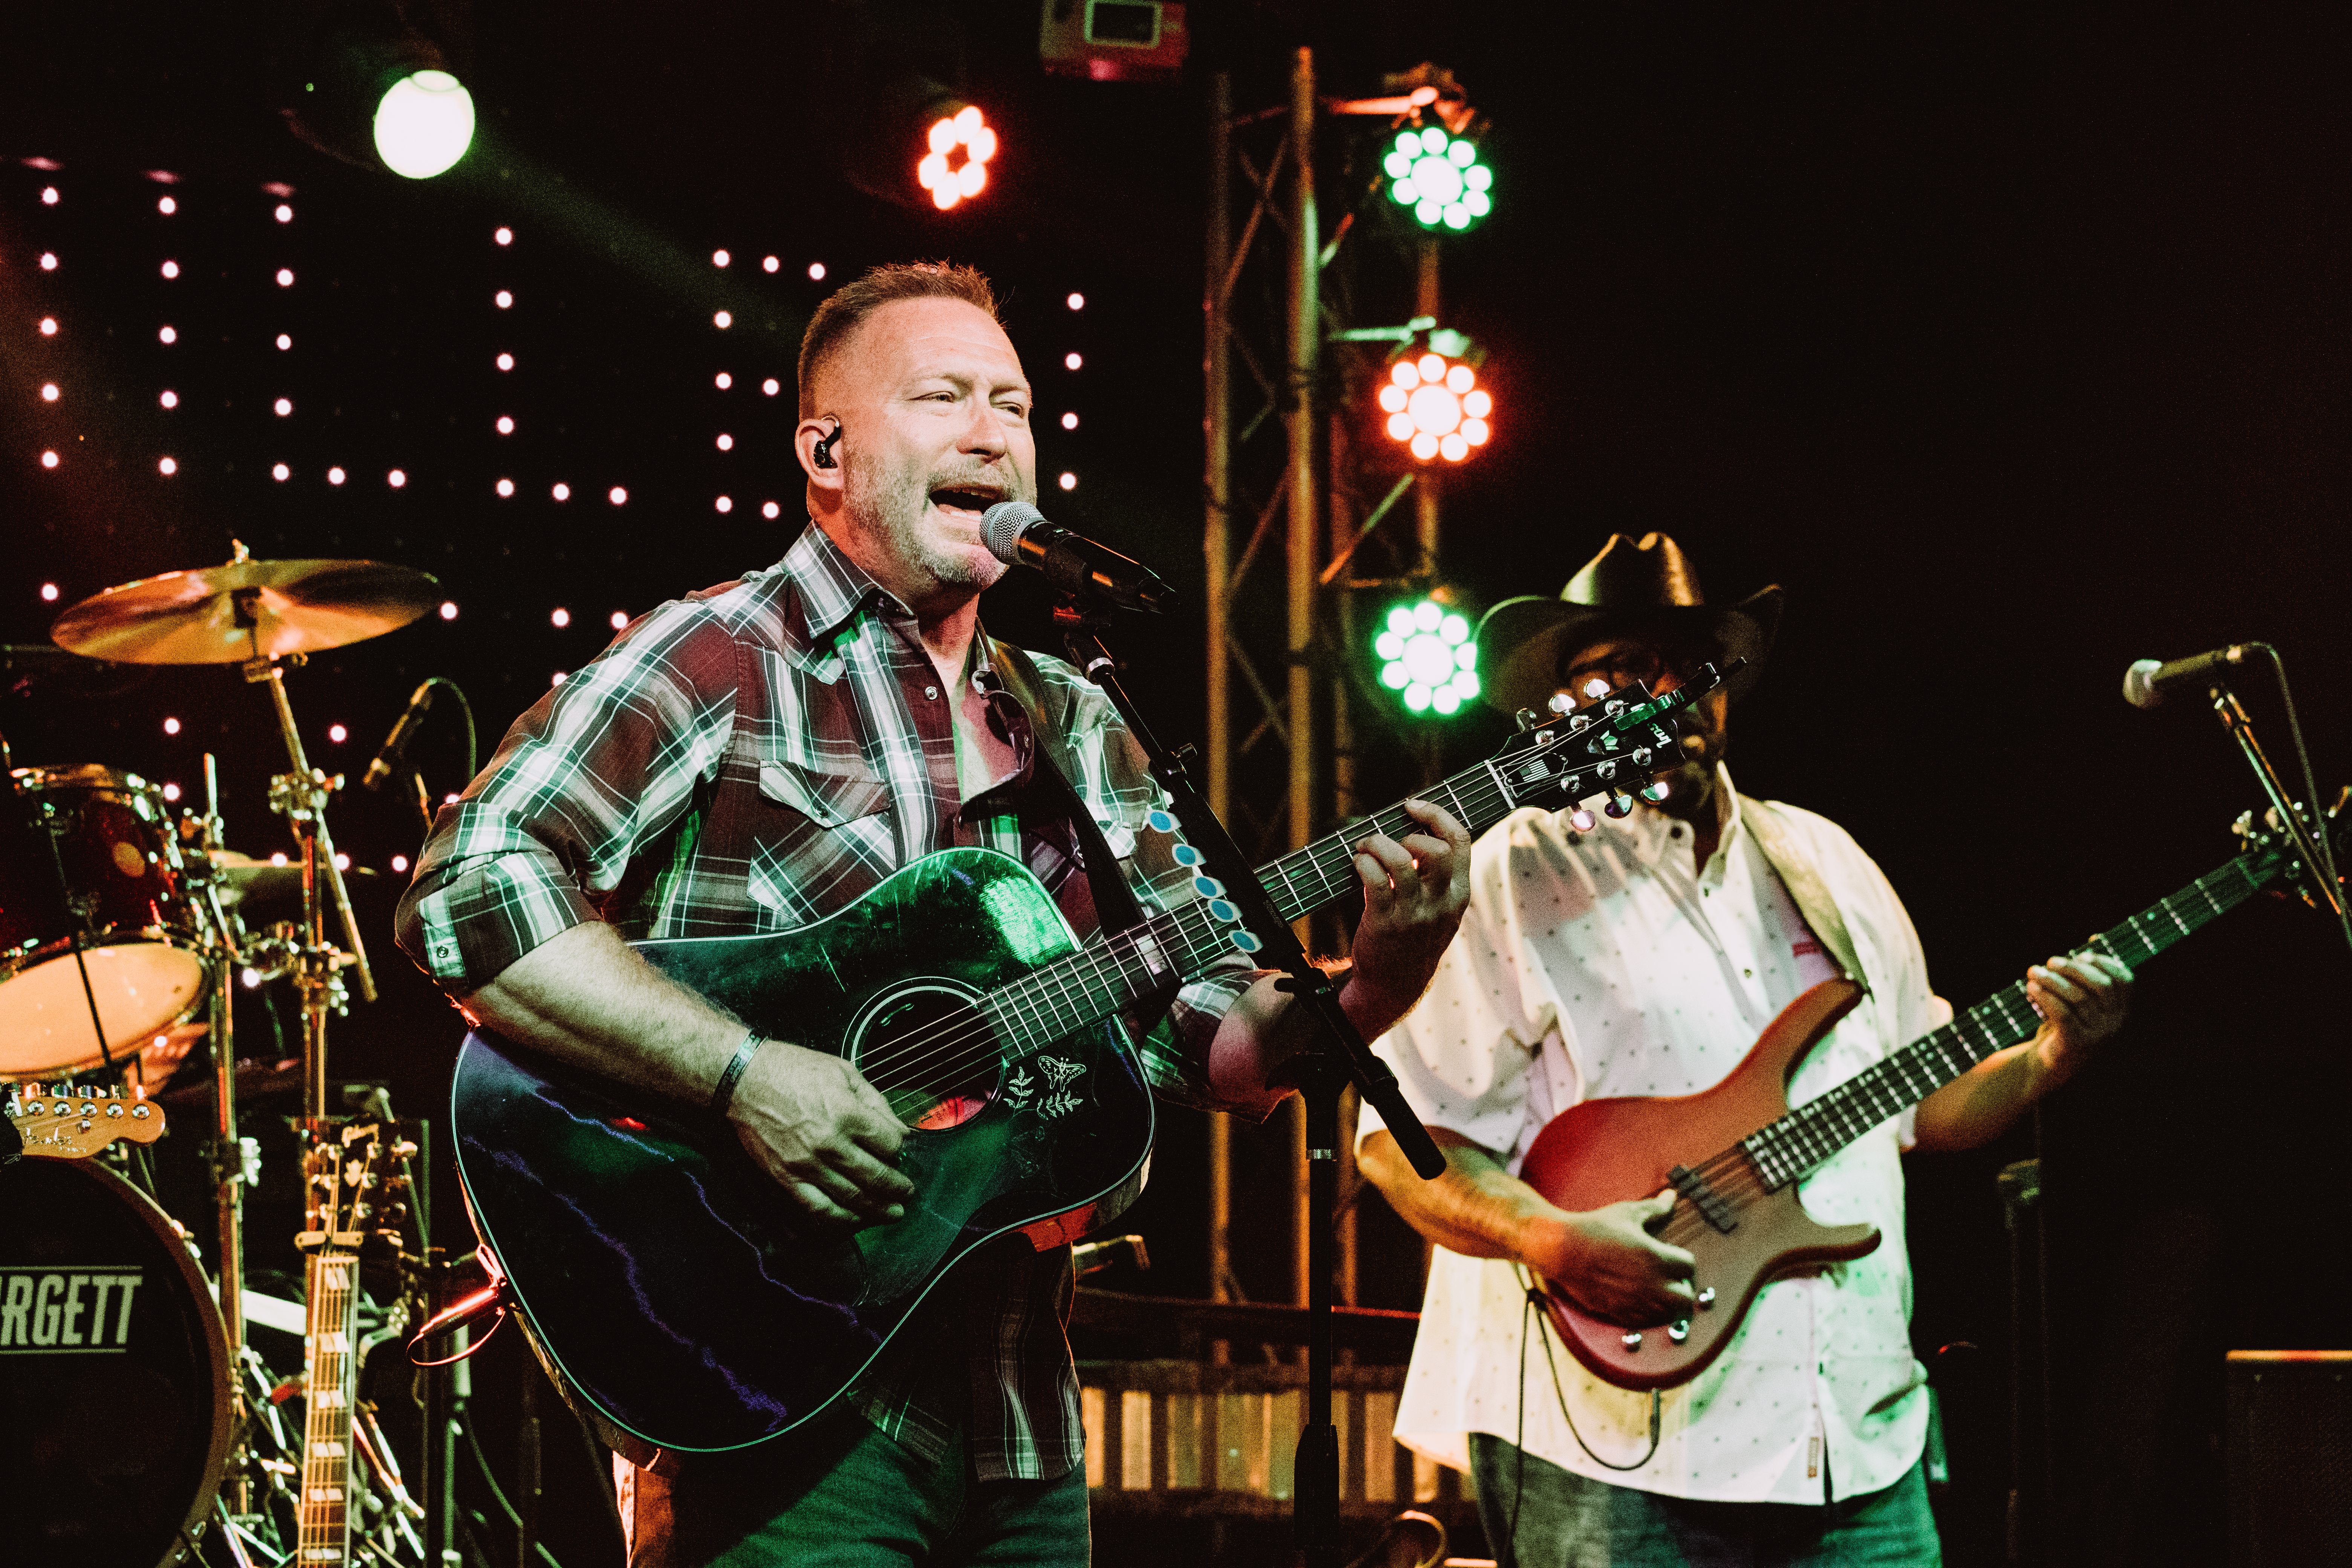 Scott McMillen & The Chase at Hard Times Café in Fredericksburg, VA on 8-06-2021. Photos © Kelli Palotay